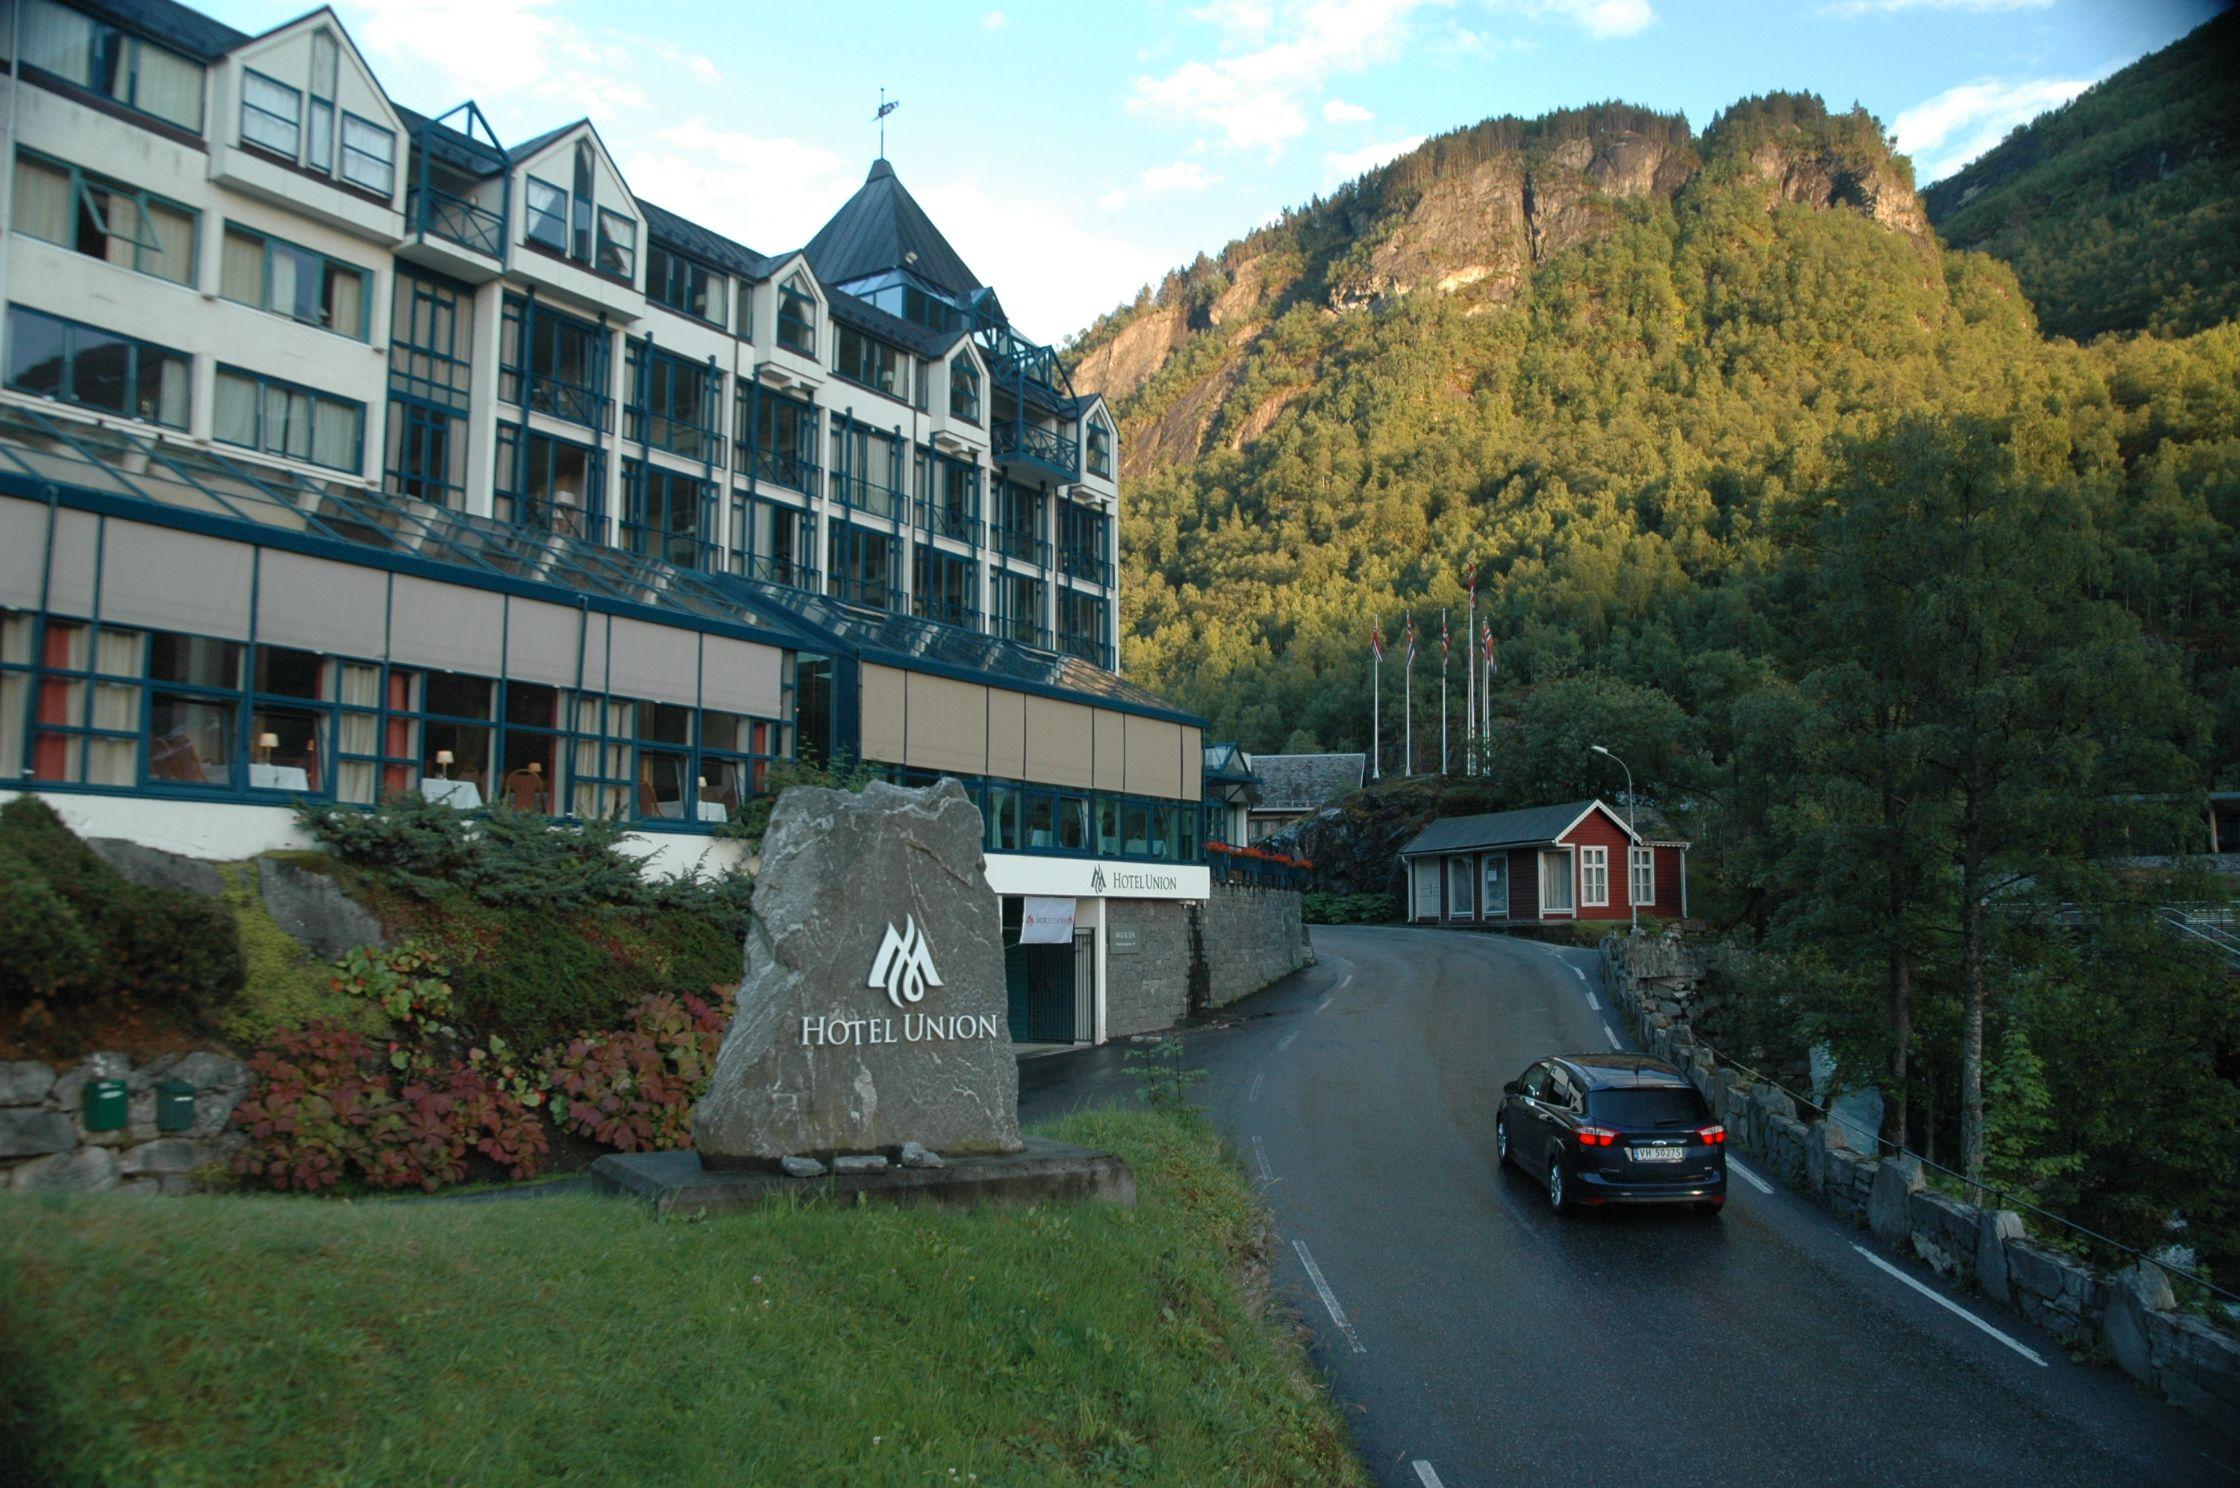 #Hotel_Union in #Geiranger Norway